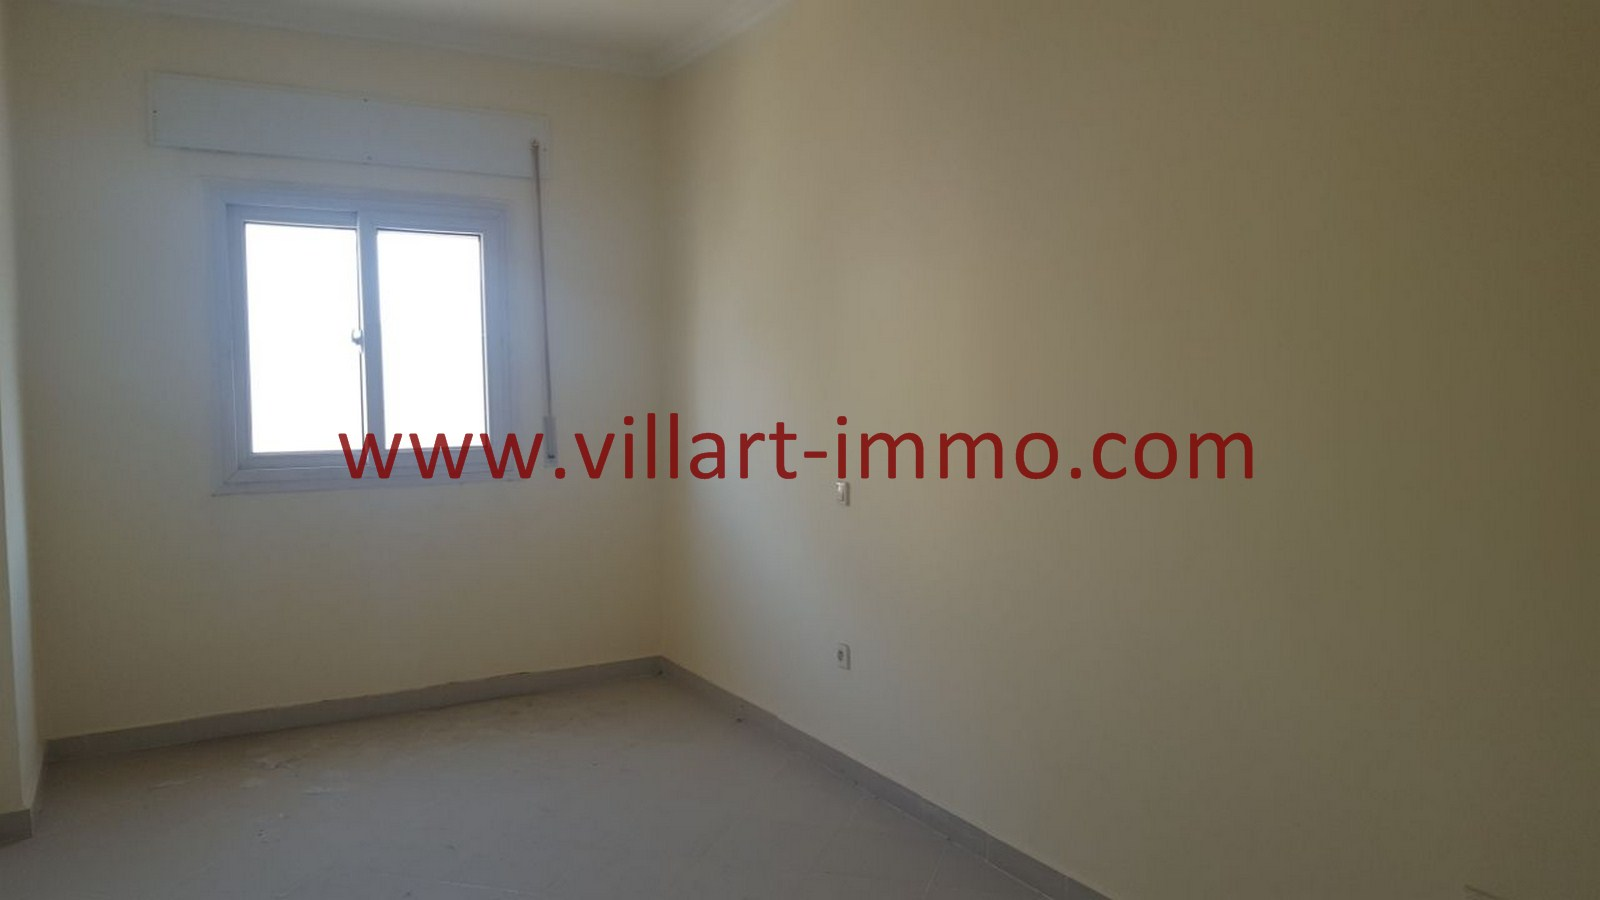 1-Vente-Appartement-Tanger-Mojahidine -Salon-VA485-Villart Immo